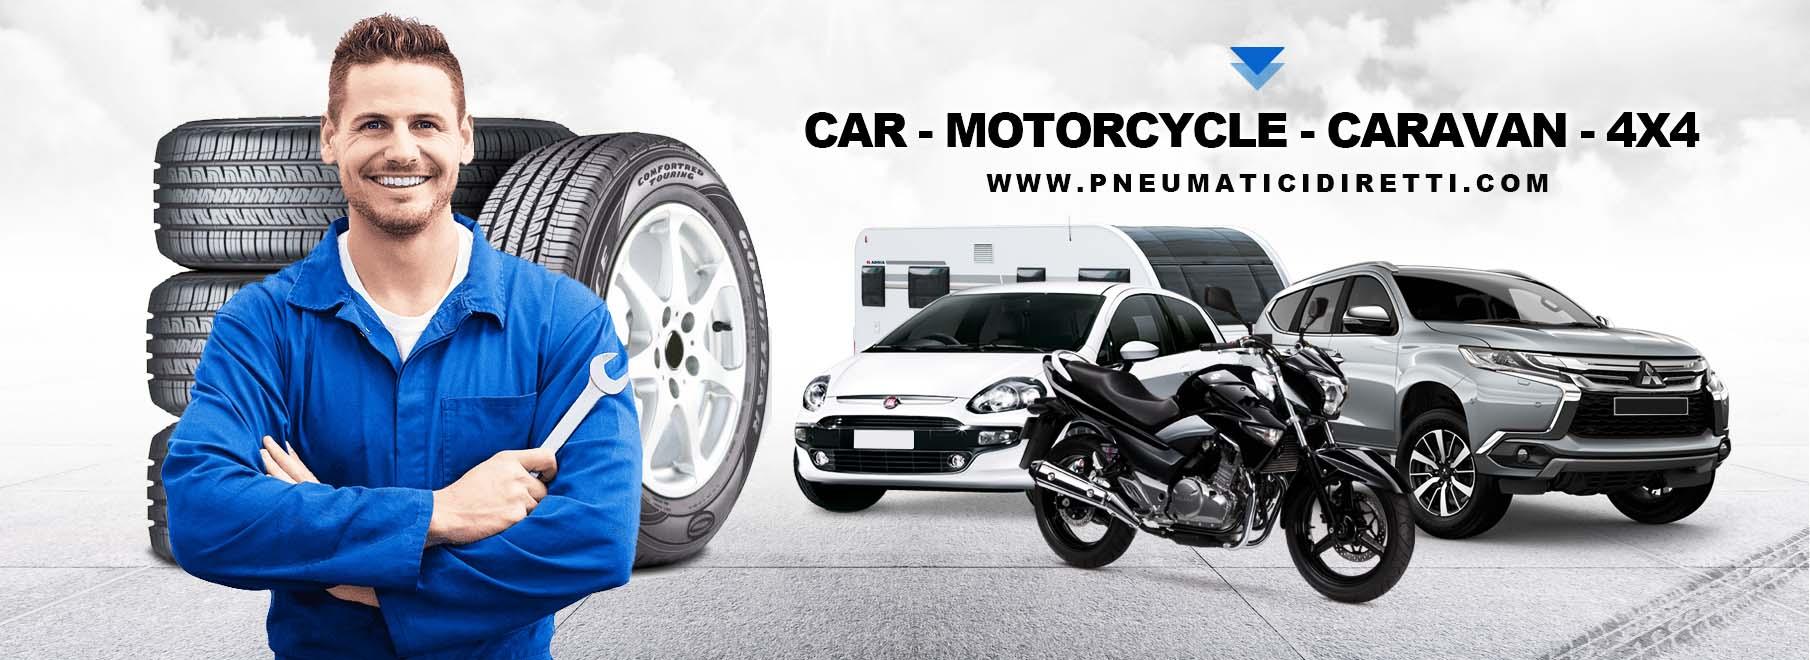 pneumaticidiretti.com -  tire sales online